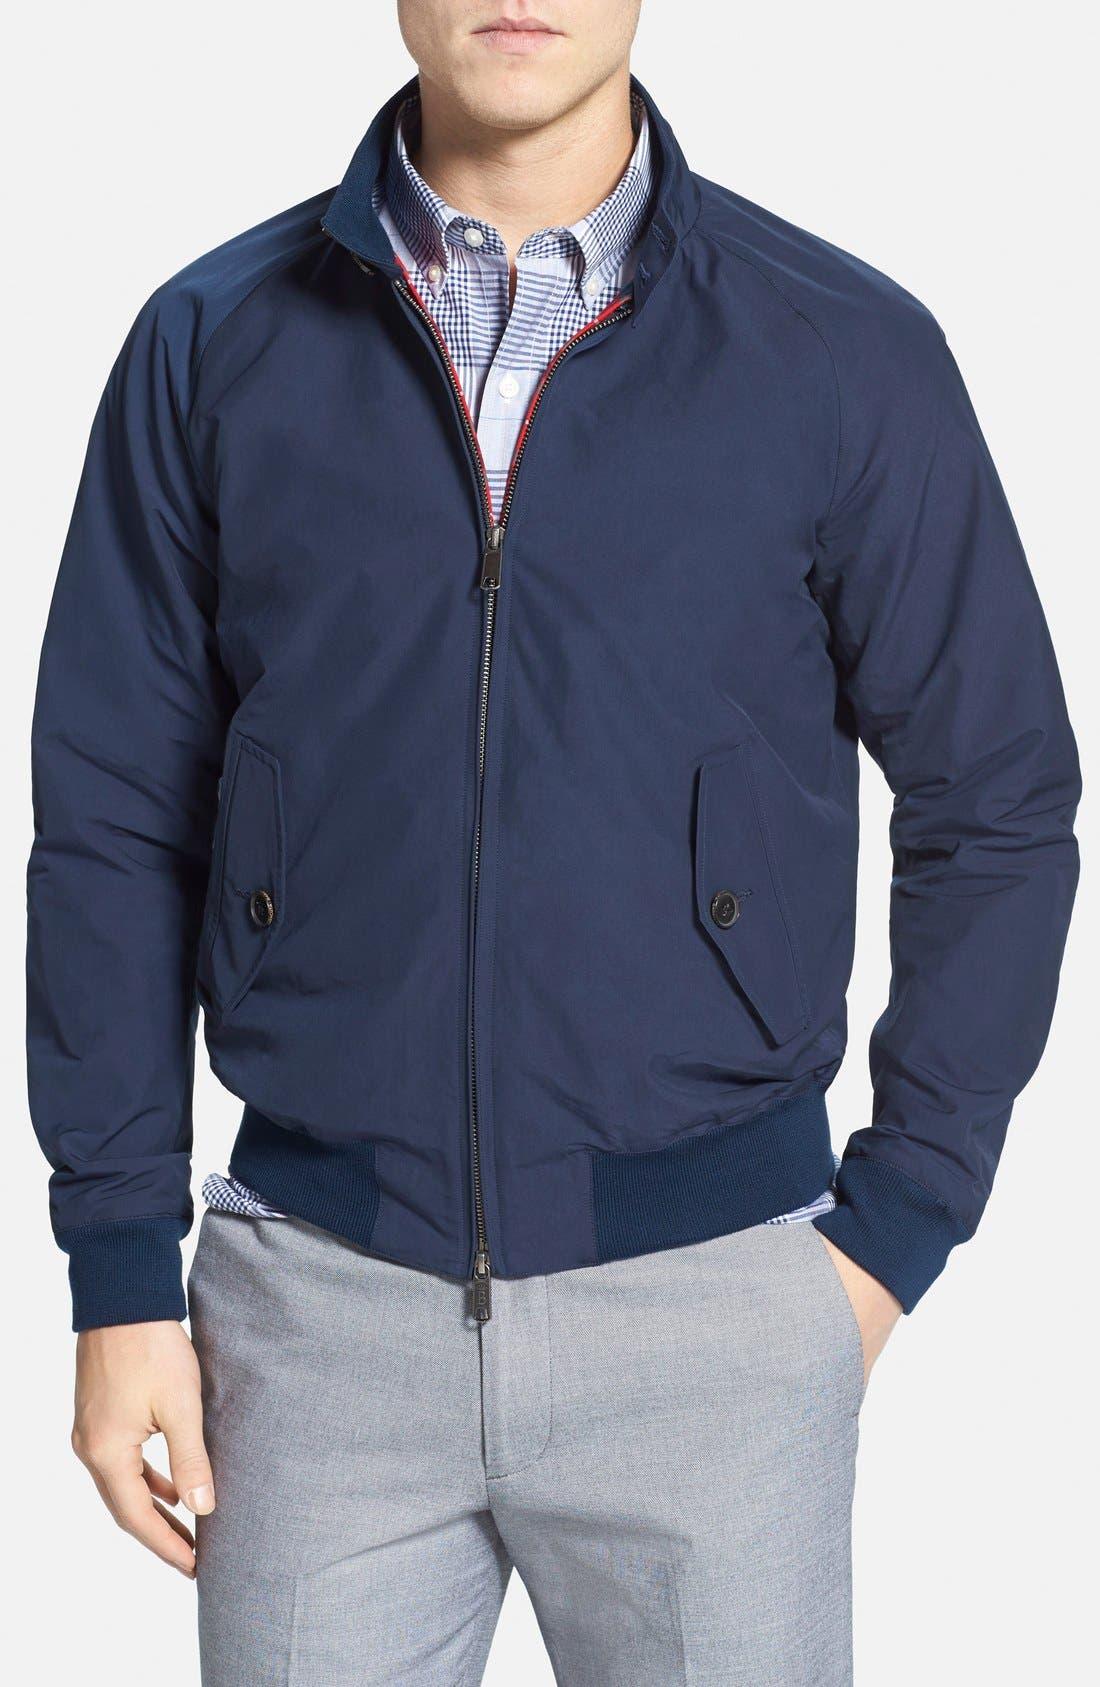 Baracuta G9 Water Repellent Harrington Jacket